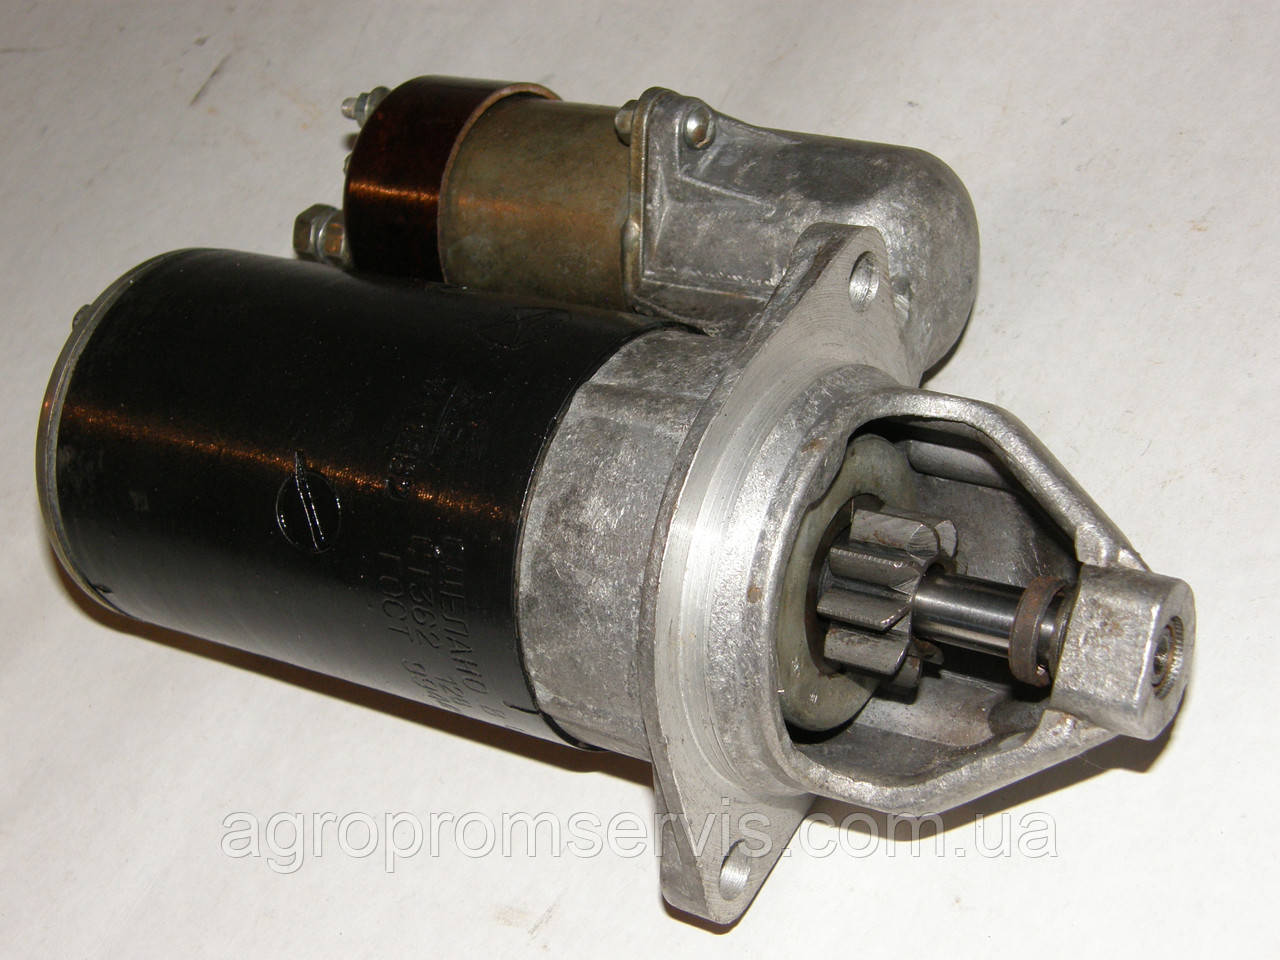 Стартер двигателя ПД-10 СТ 362-3708000 (электрический)